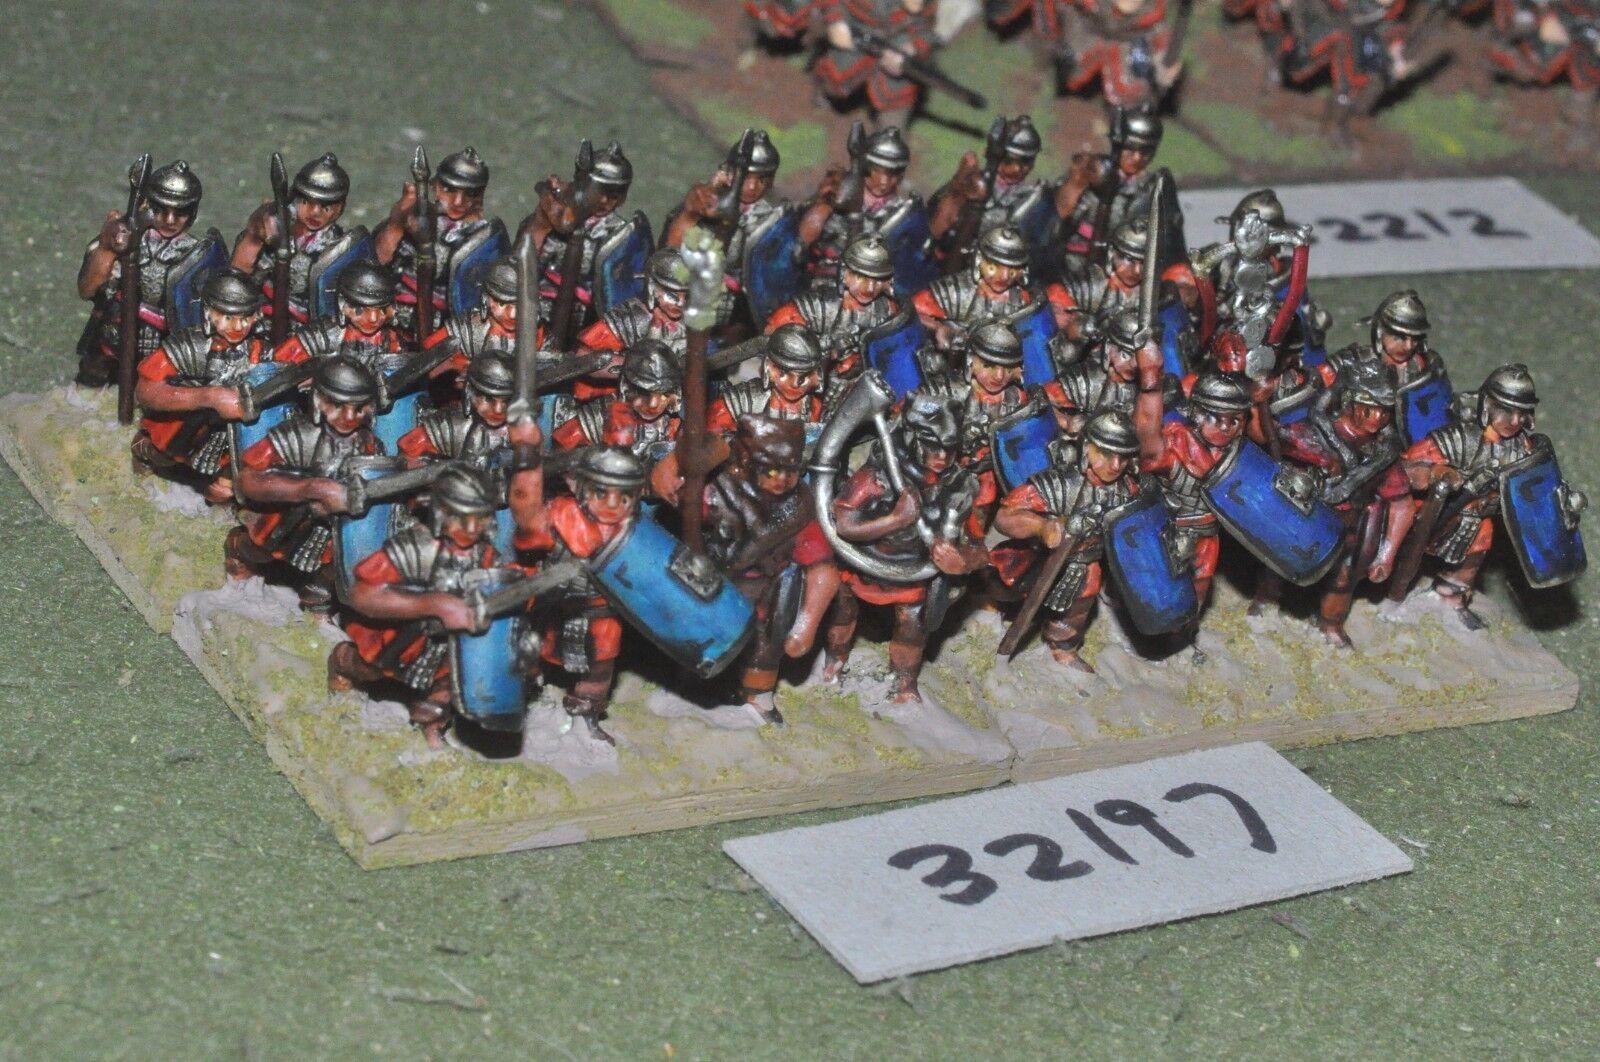 25mm roman era   roman - legionaries 32 figures figures figures - inf (32197) 69b74b